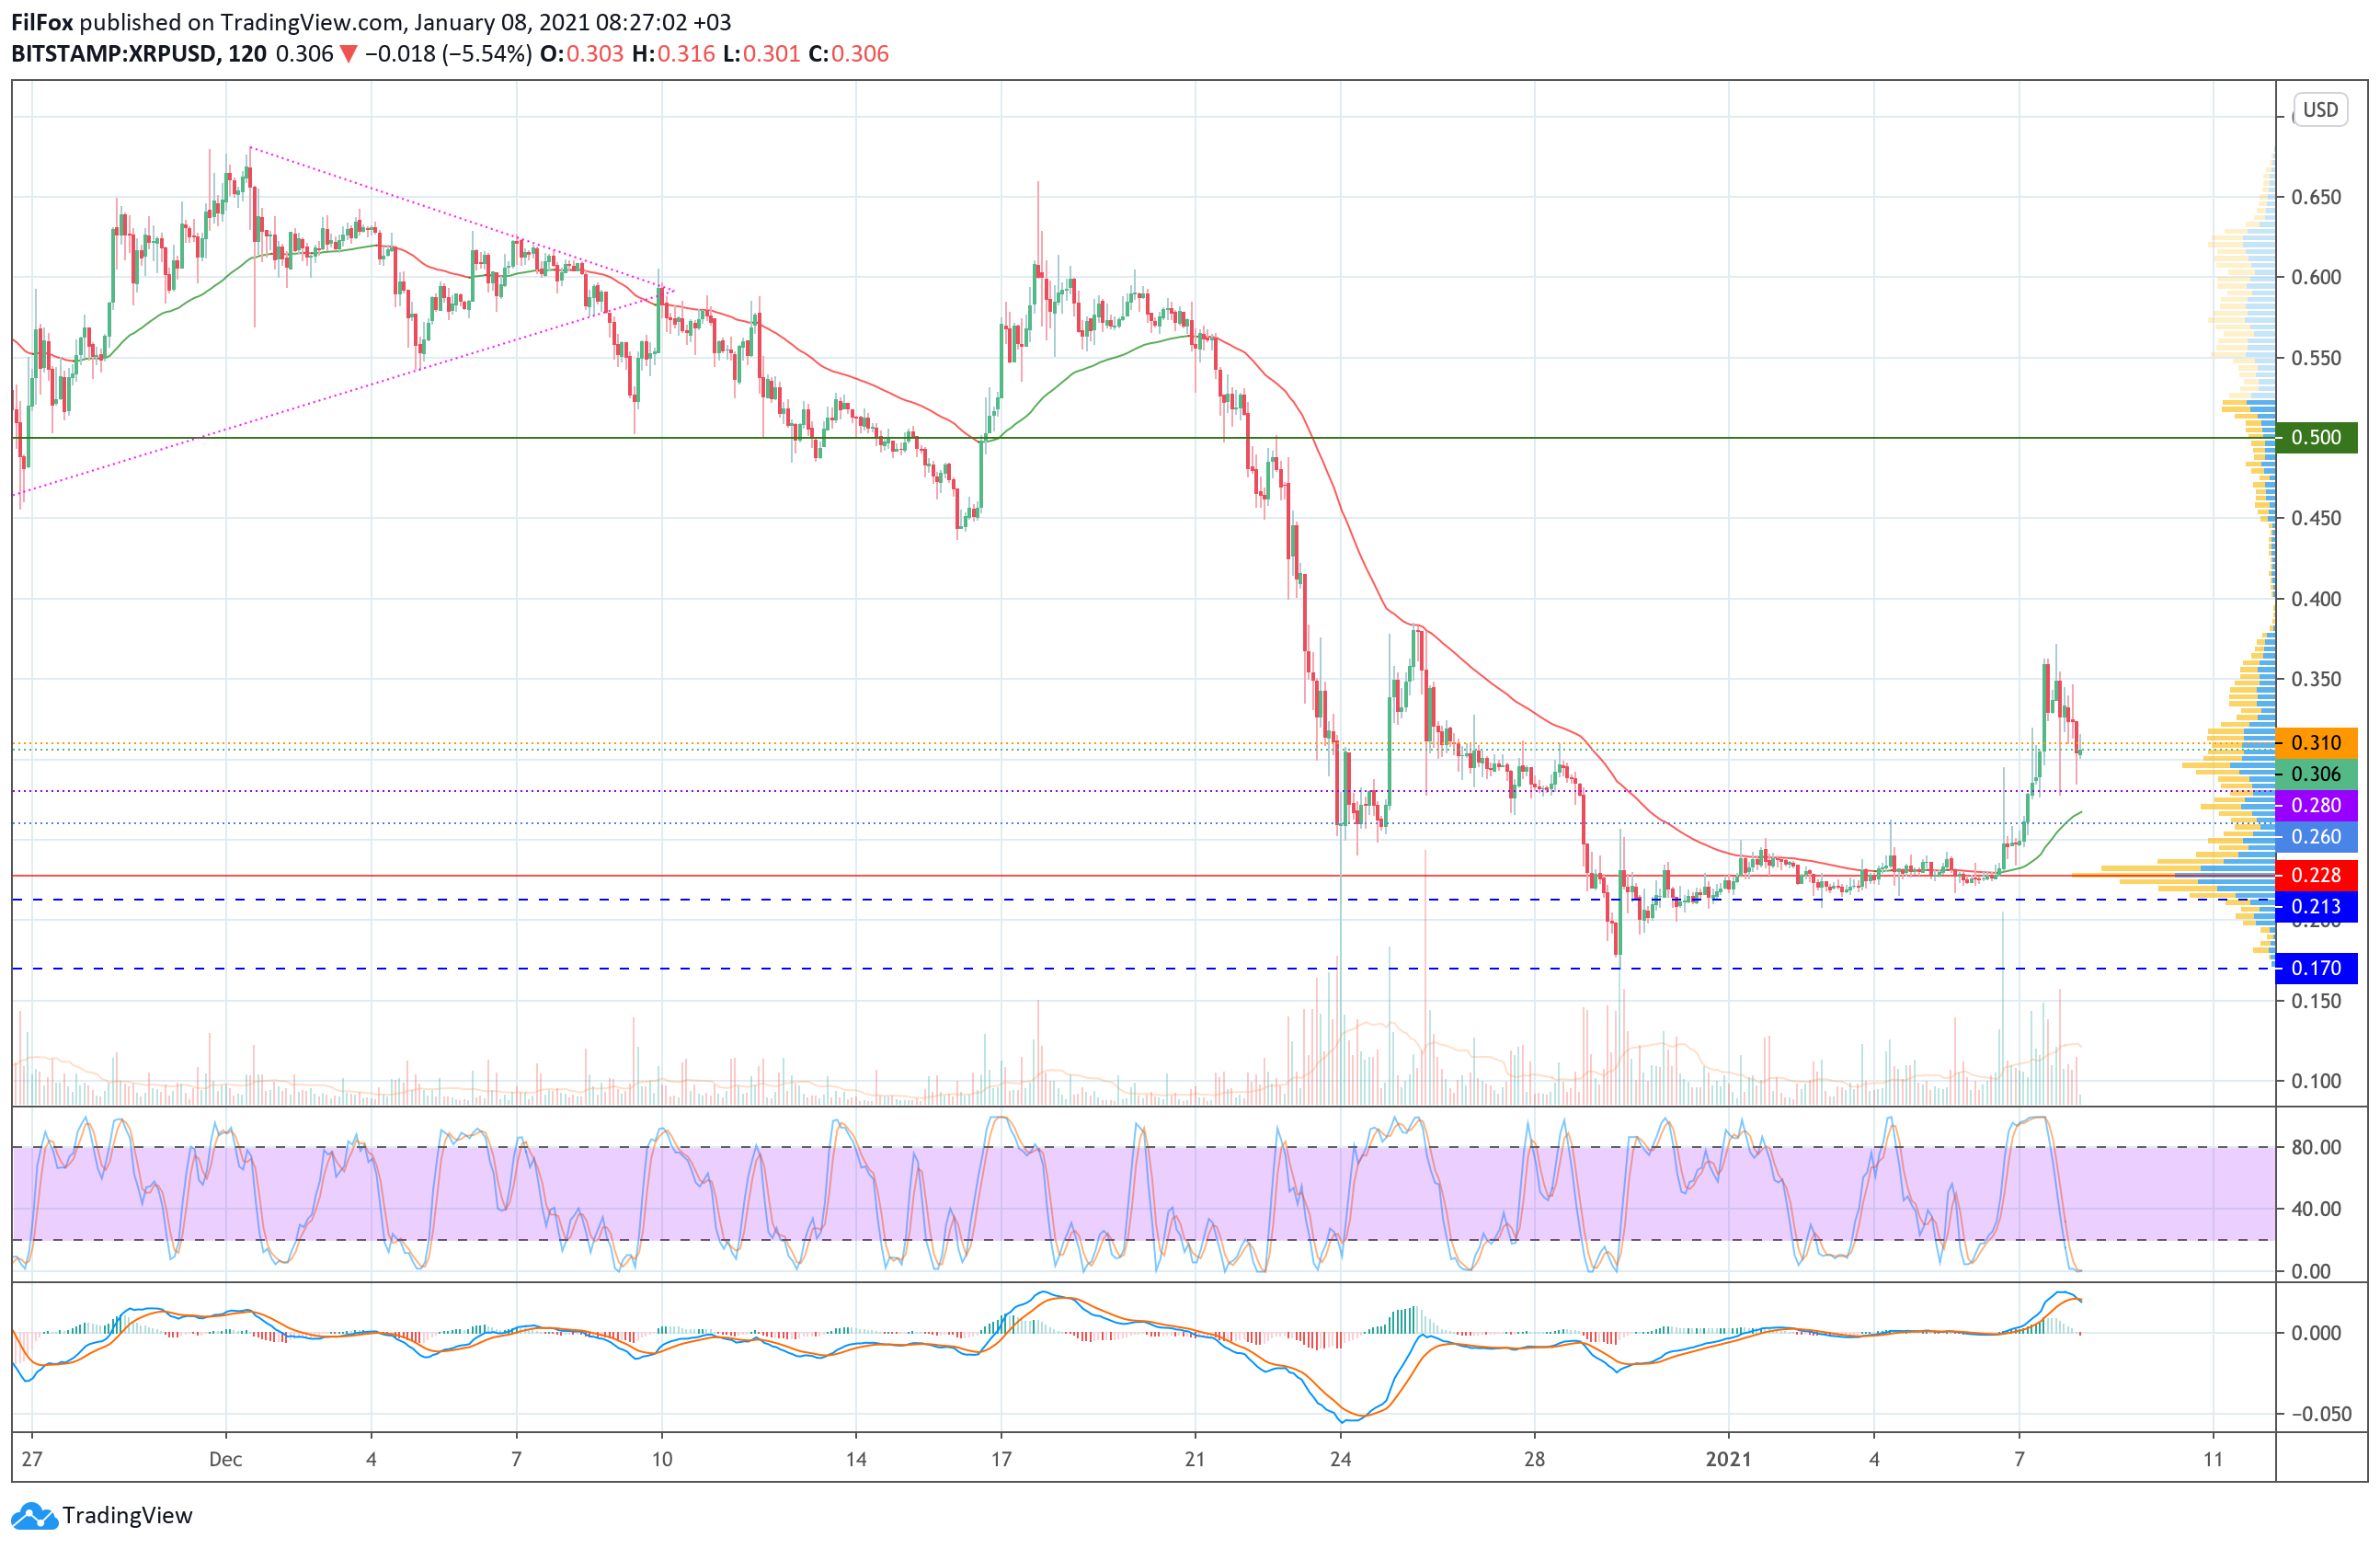 Анализ цен Bitcoin, Ethereum, Ripple на 08.01.2021